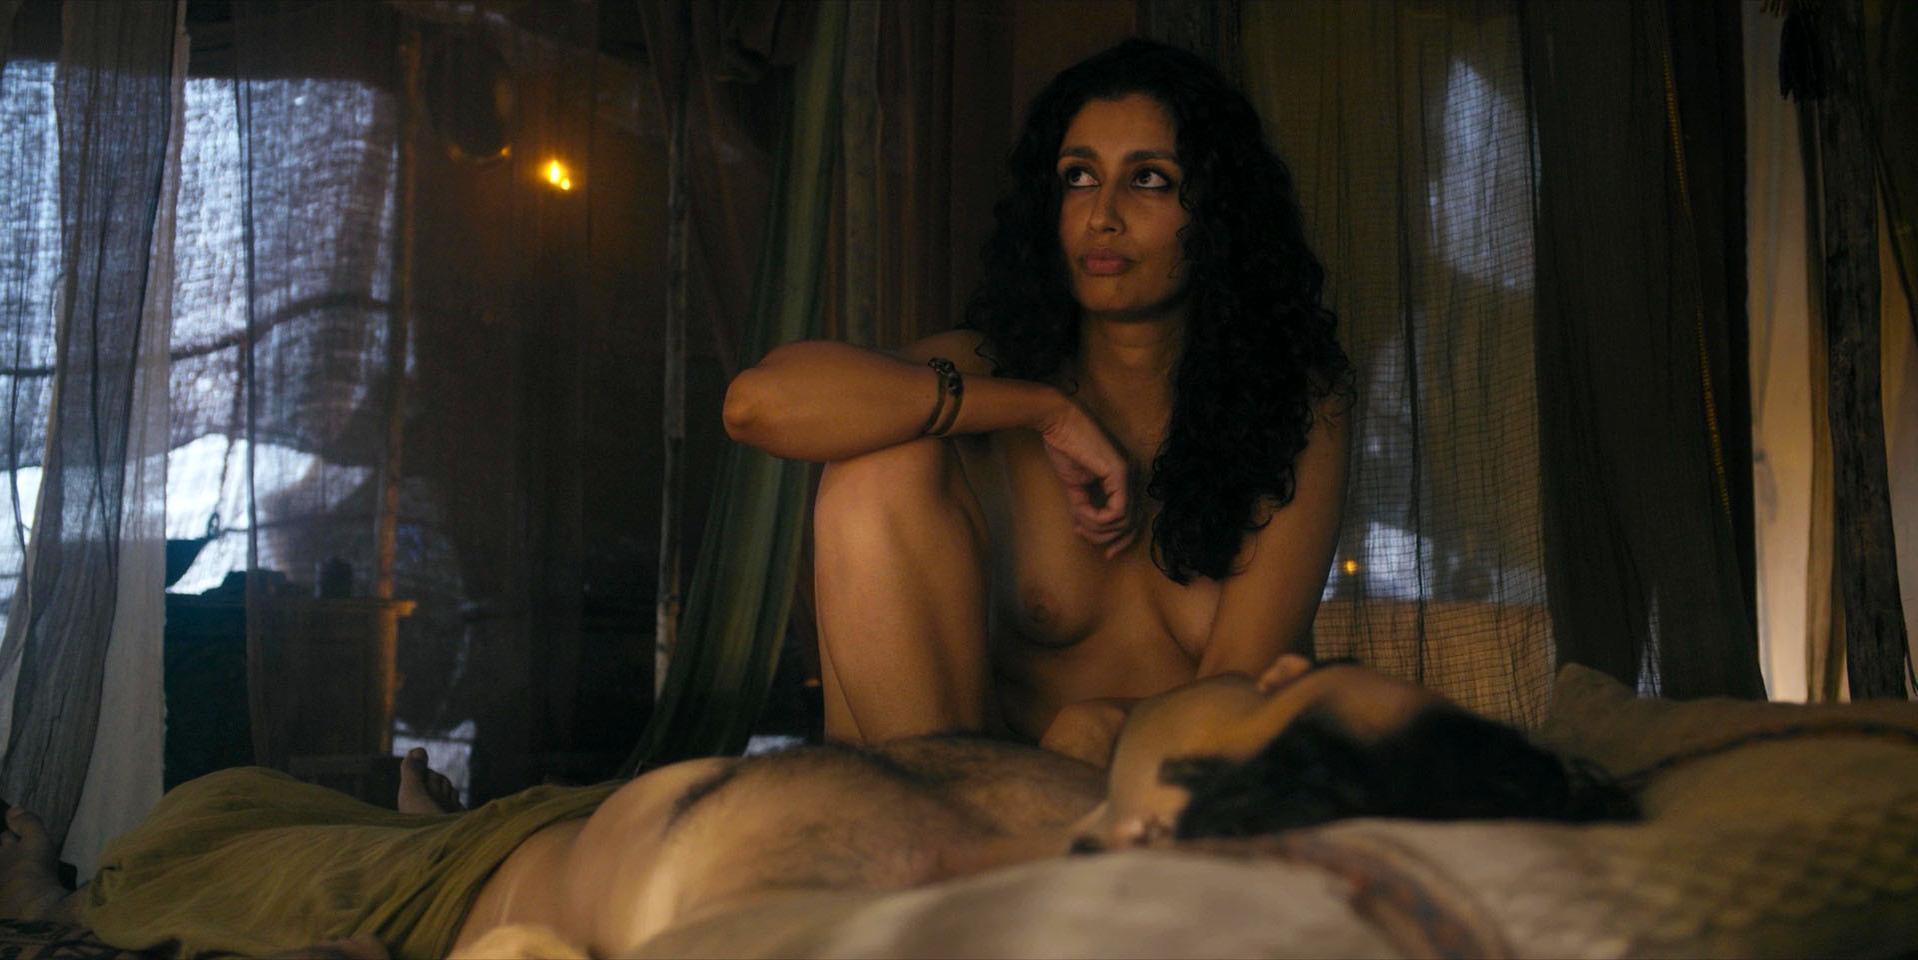 Karishma Ahluwalia nude - Marco Polo s02e05 (2016)